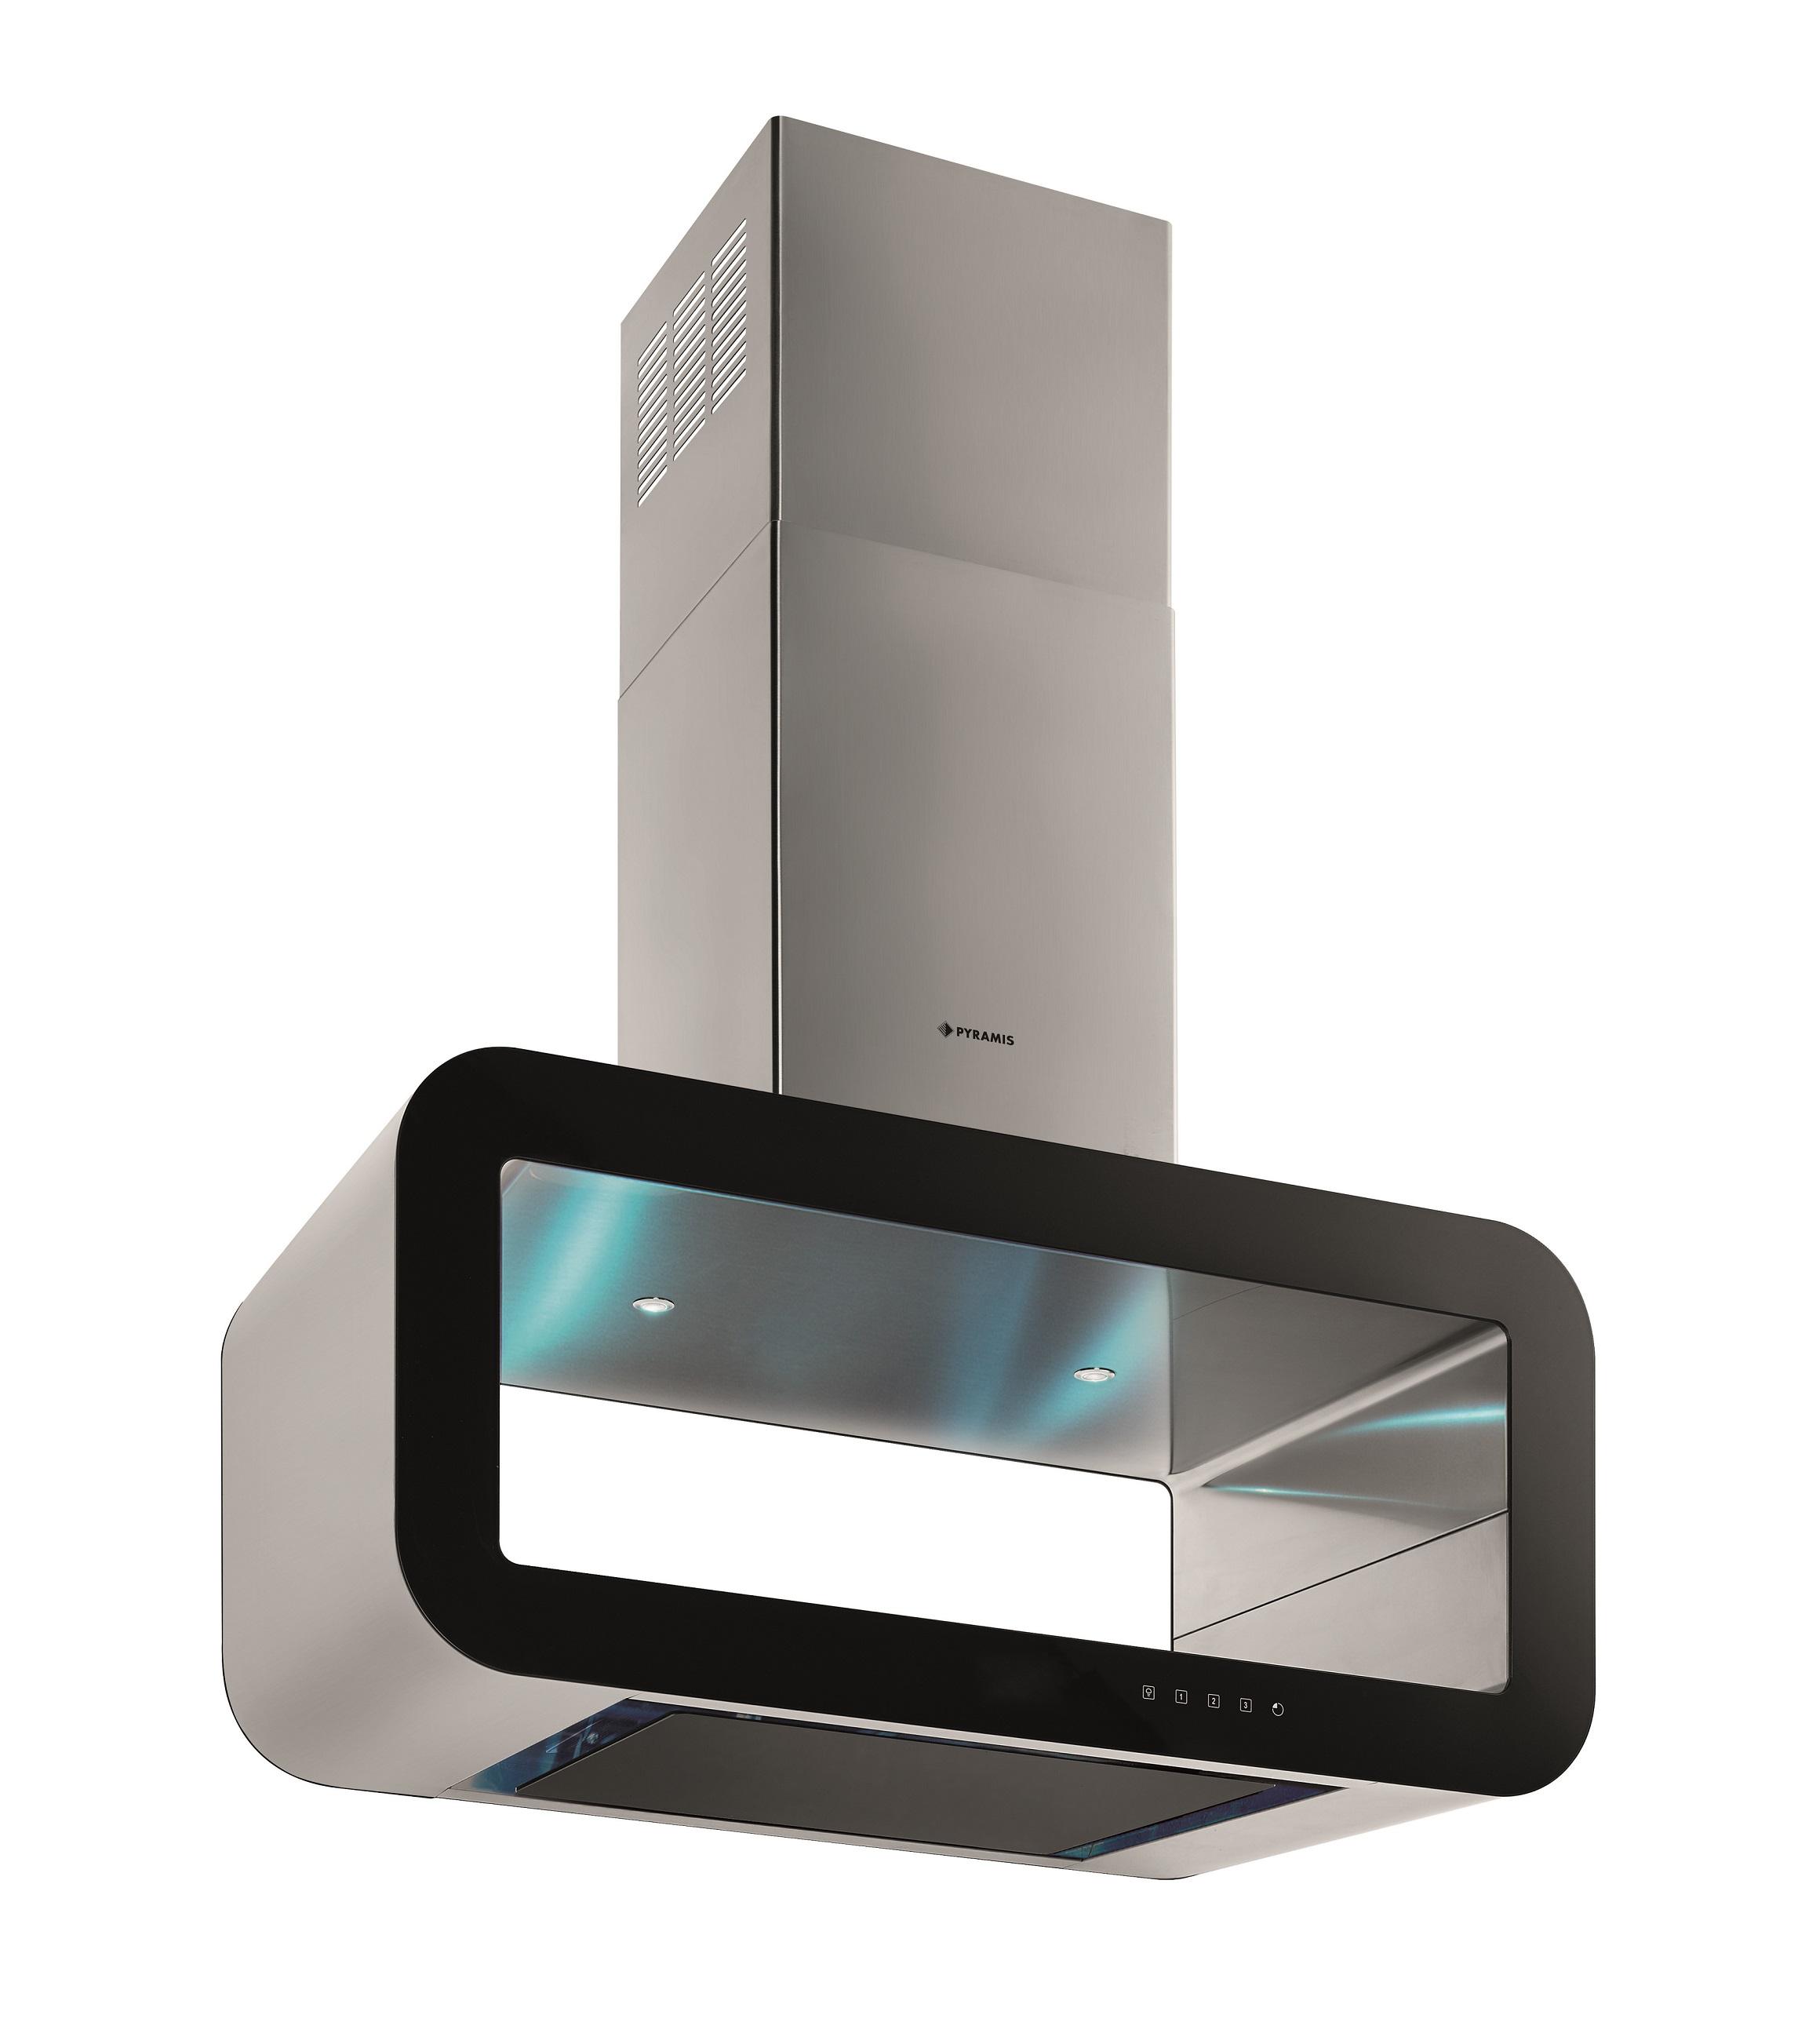 Pyramis Dunstabzugshaube Inselhaube Edelstahl freihängend Glas 90 cm LED Touch